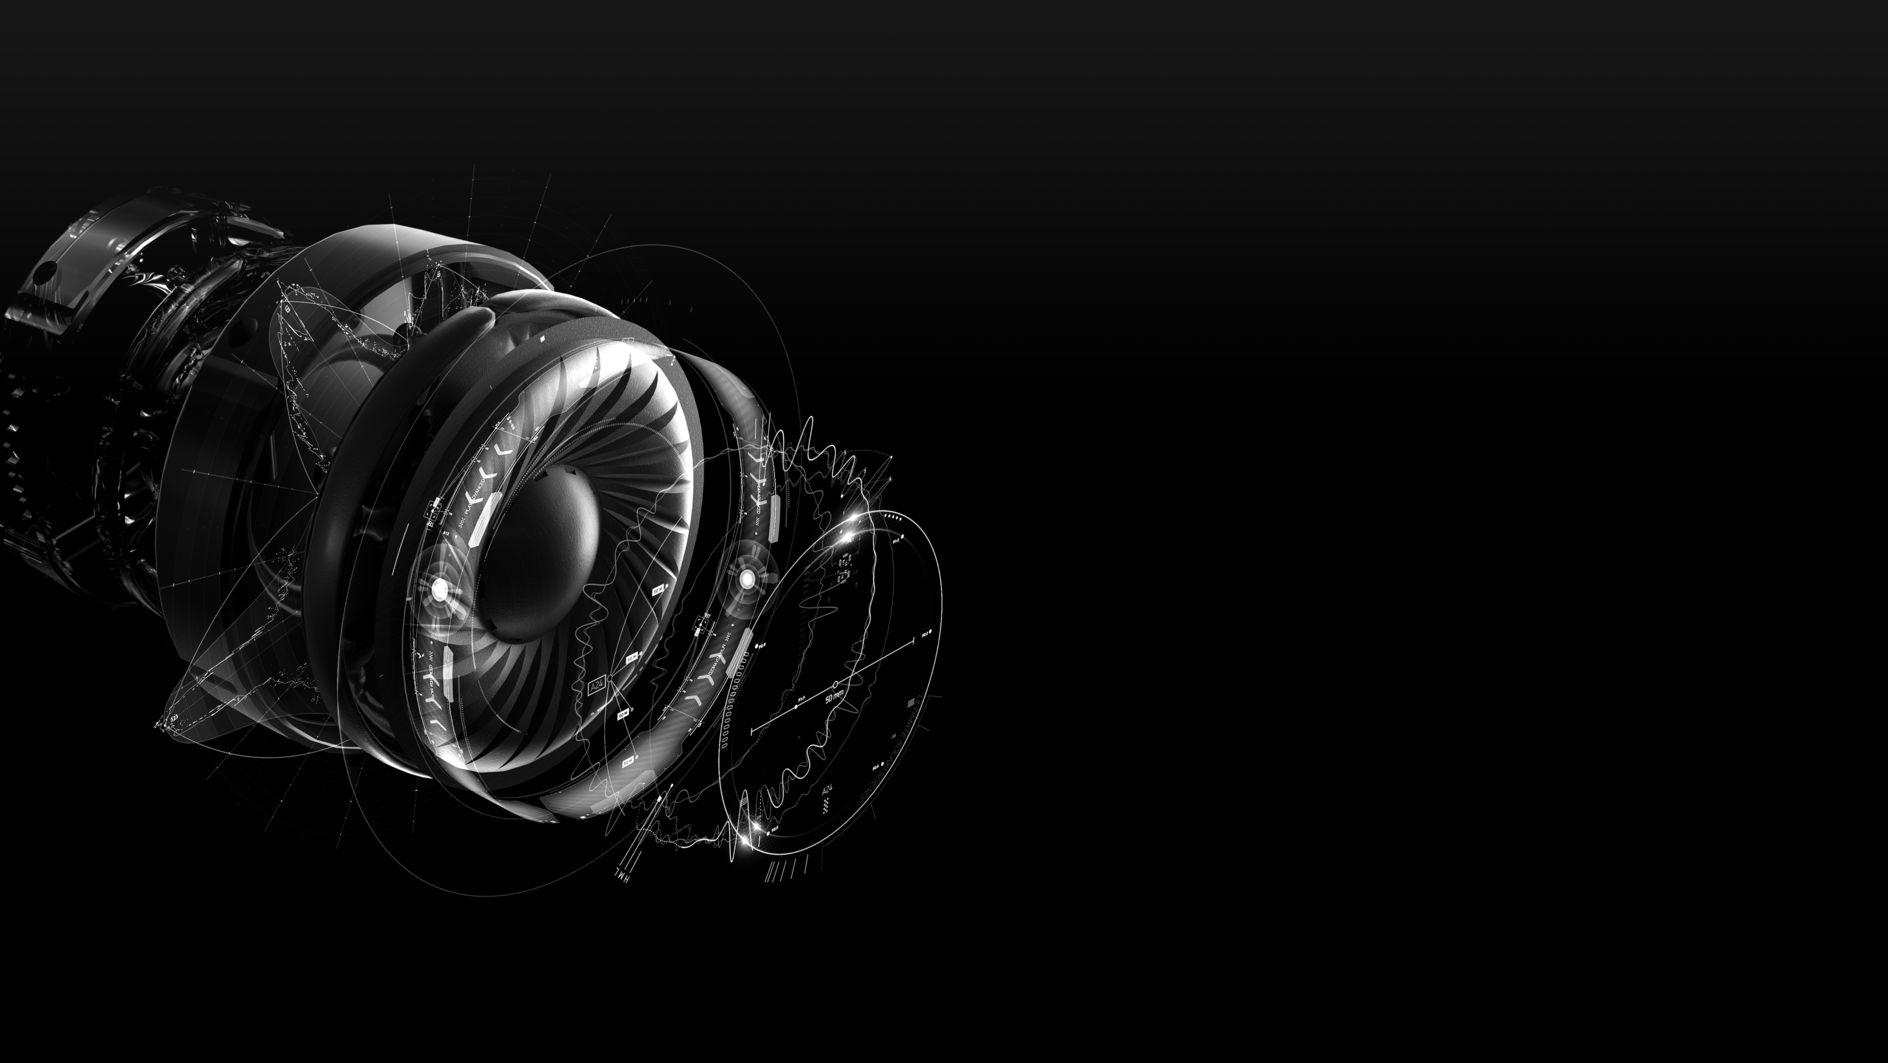 Žaidimų ausinės Logitech G PRO X, BLUE VO!CE, PRO-G 50mm, DTS X 2.0, USB ir 3,5mm jungtys